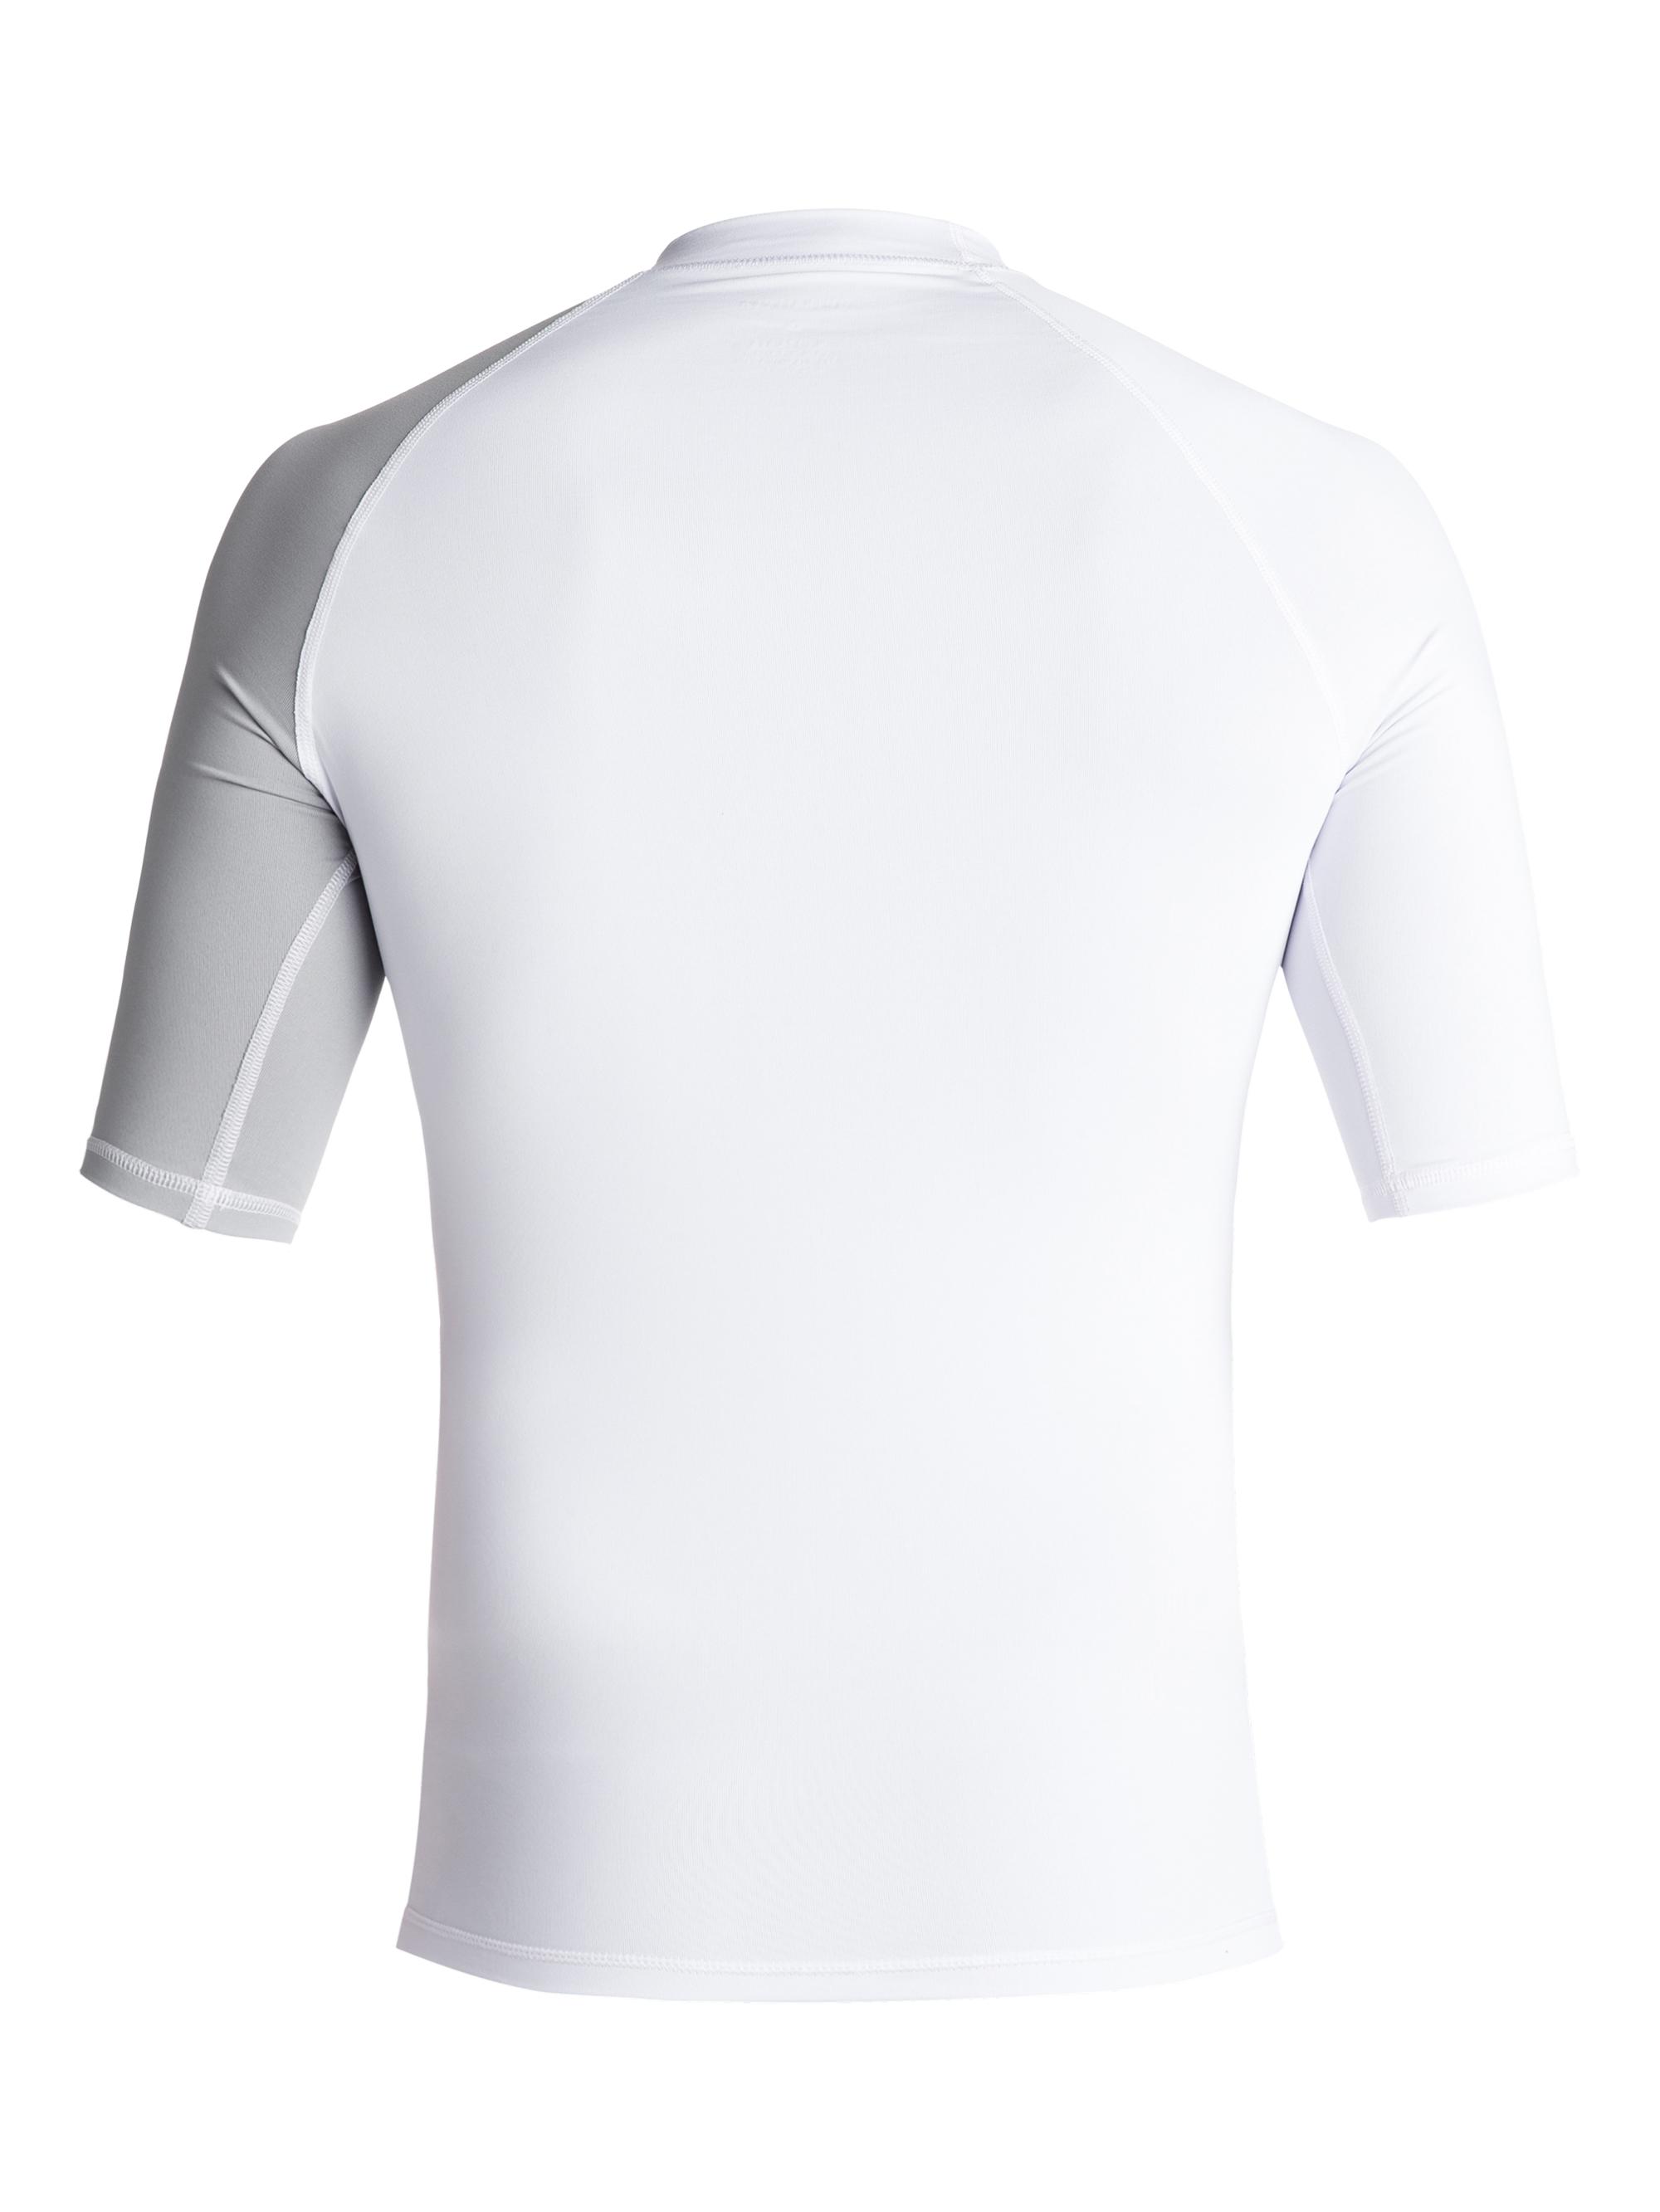 Lycra Quiksilver Active Shortsleeve Rashguard (White / Sleet) Ss18